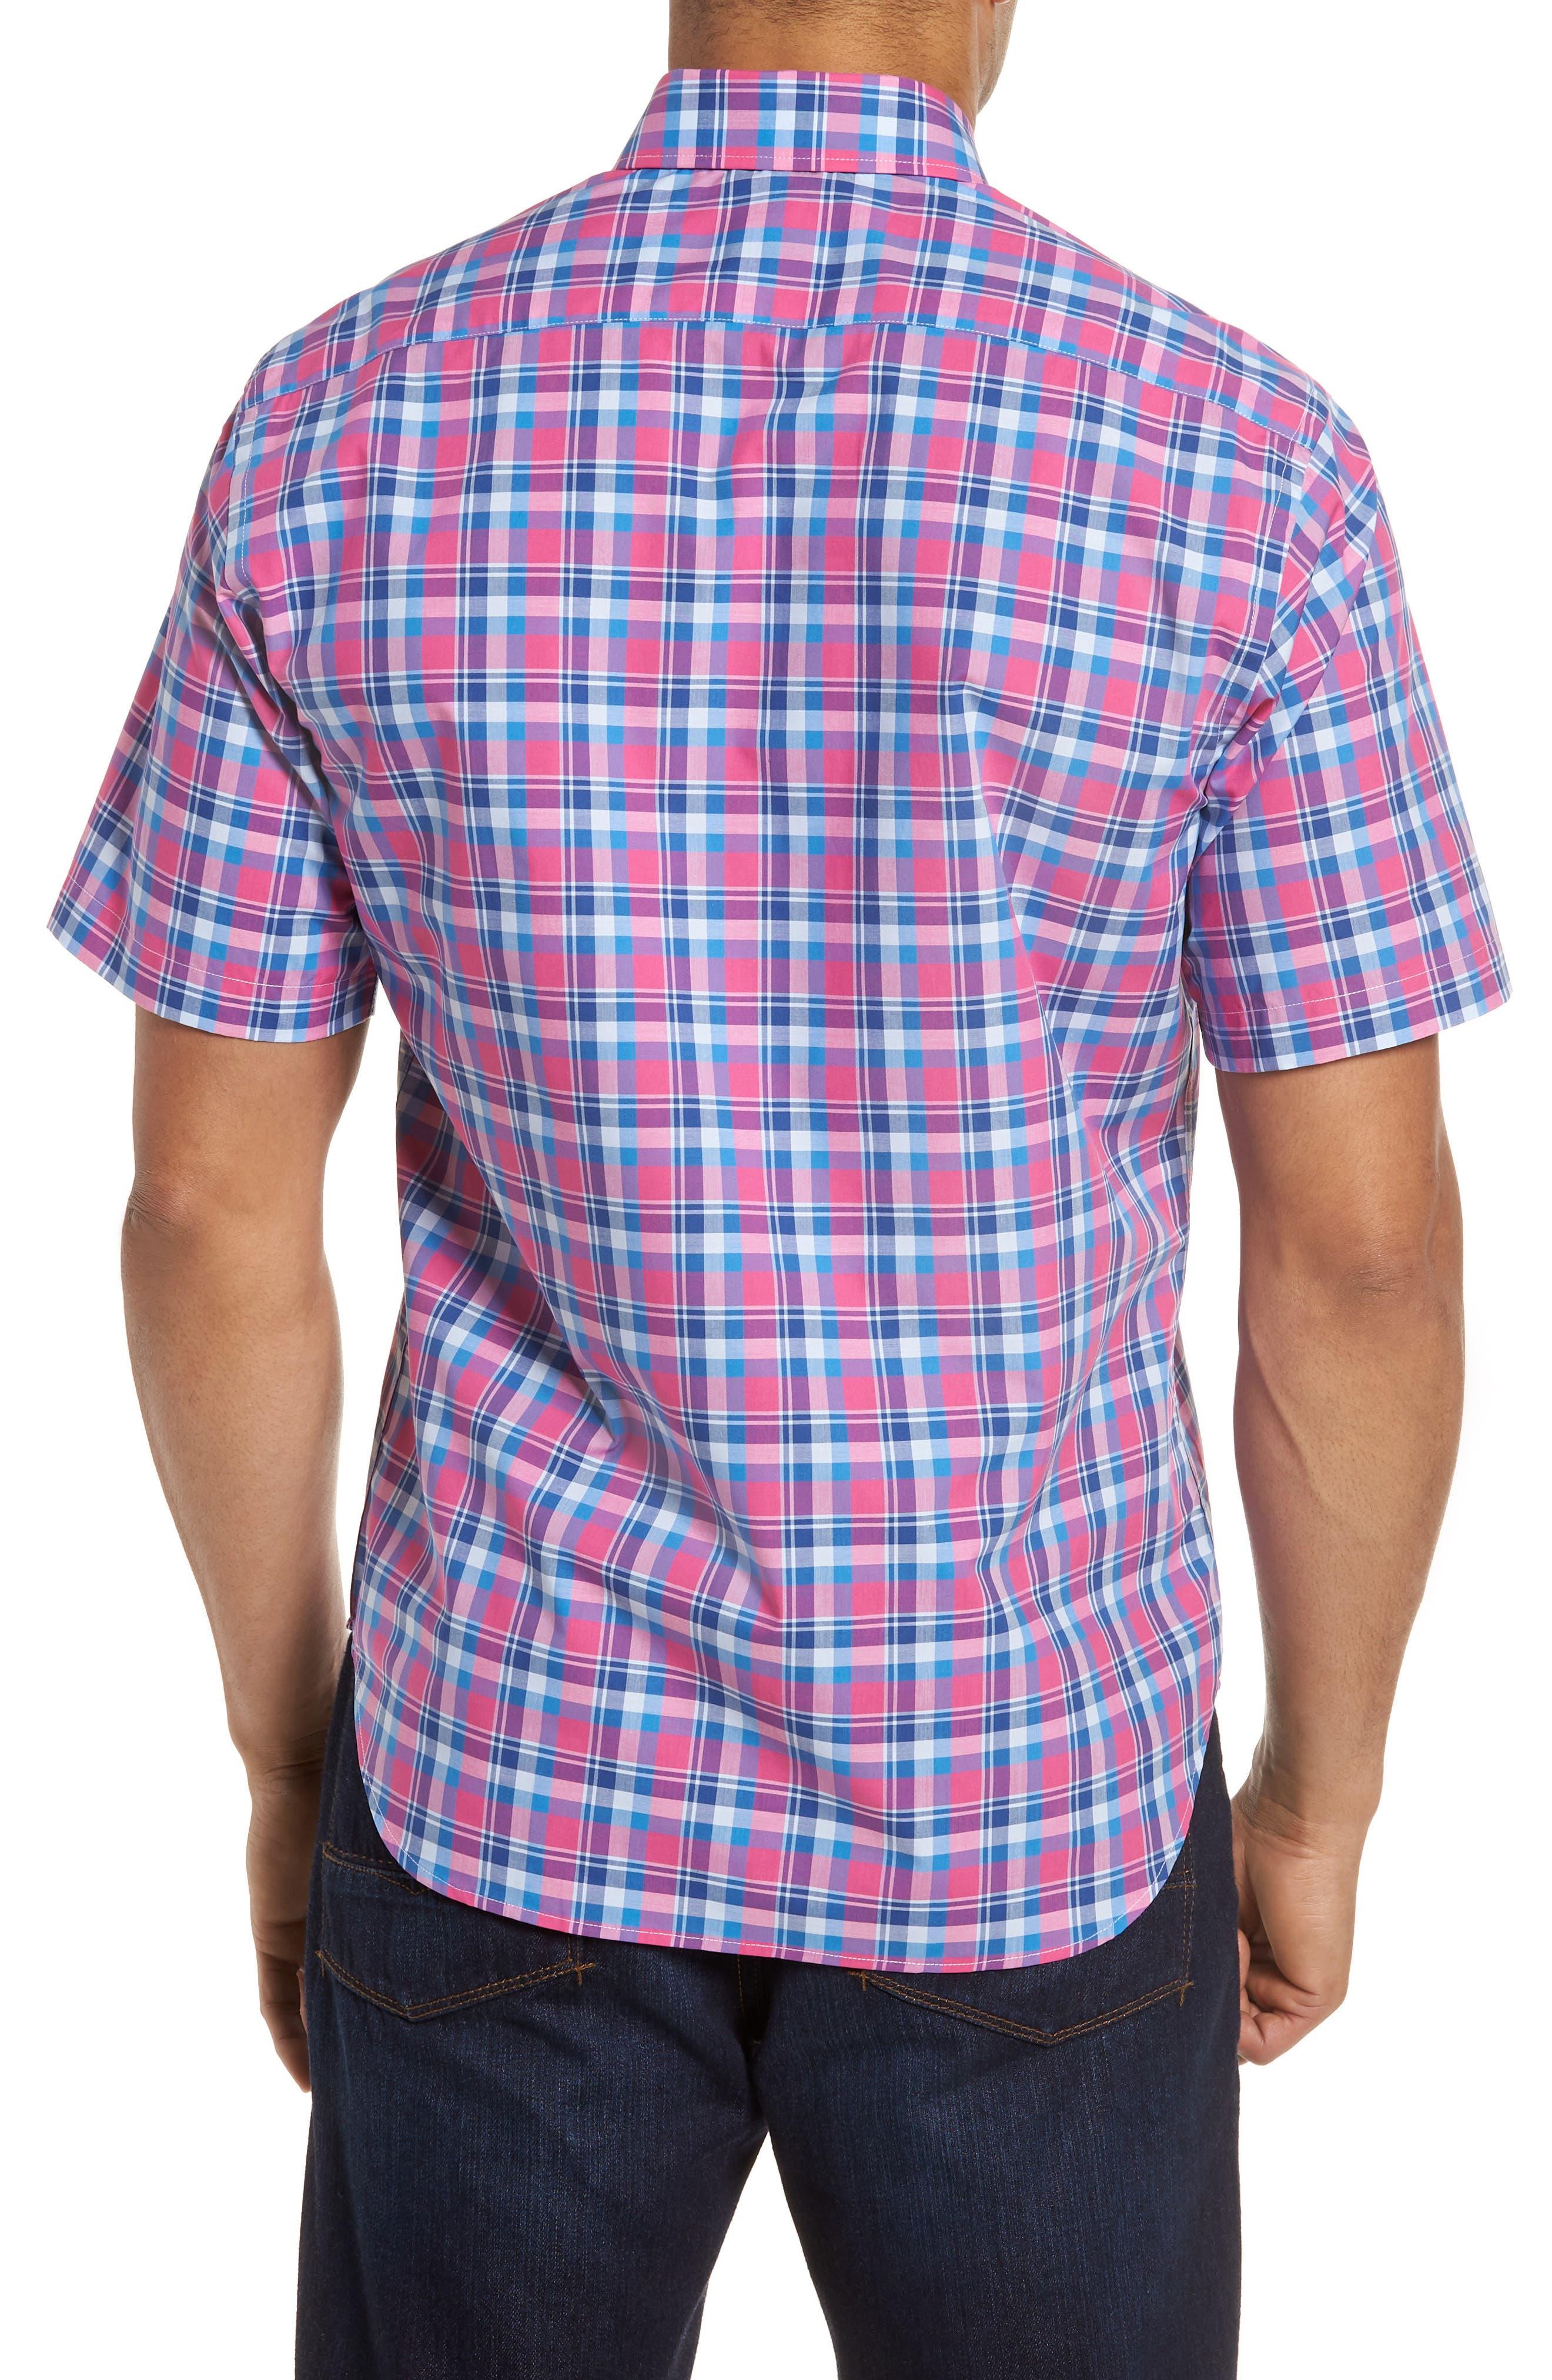 Sloane Regular Fit Plaid Sport Shirt,                             Alternate thumbnail 2, color,                             Pink